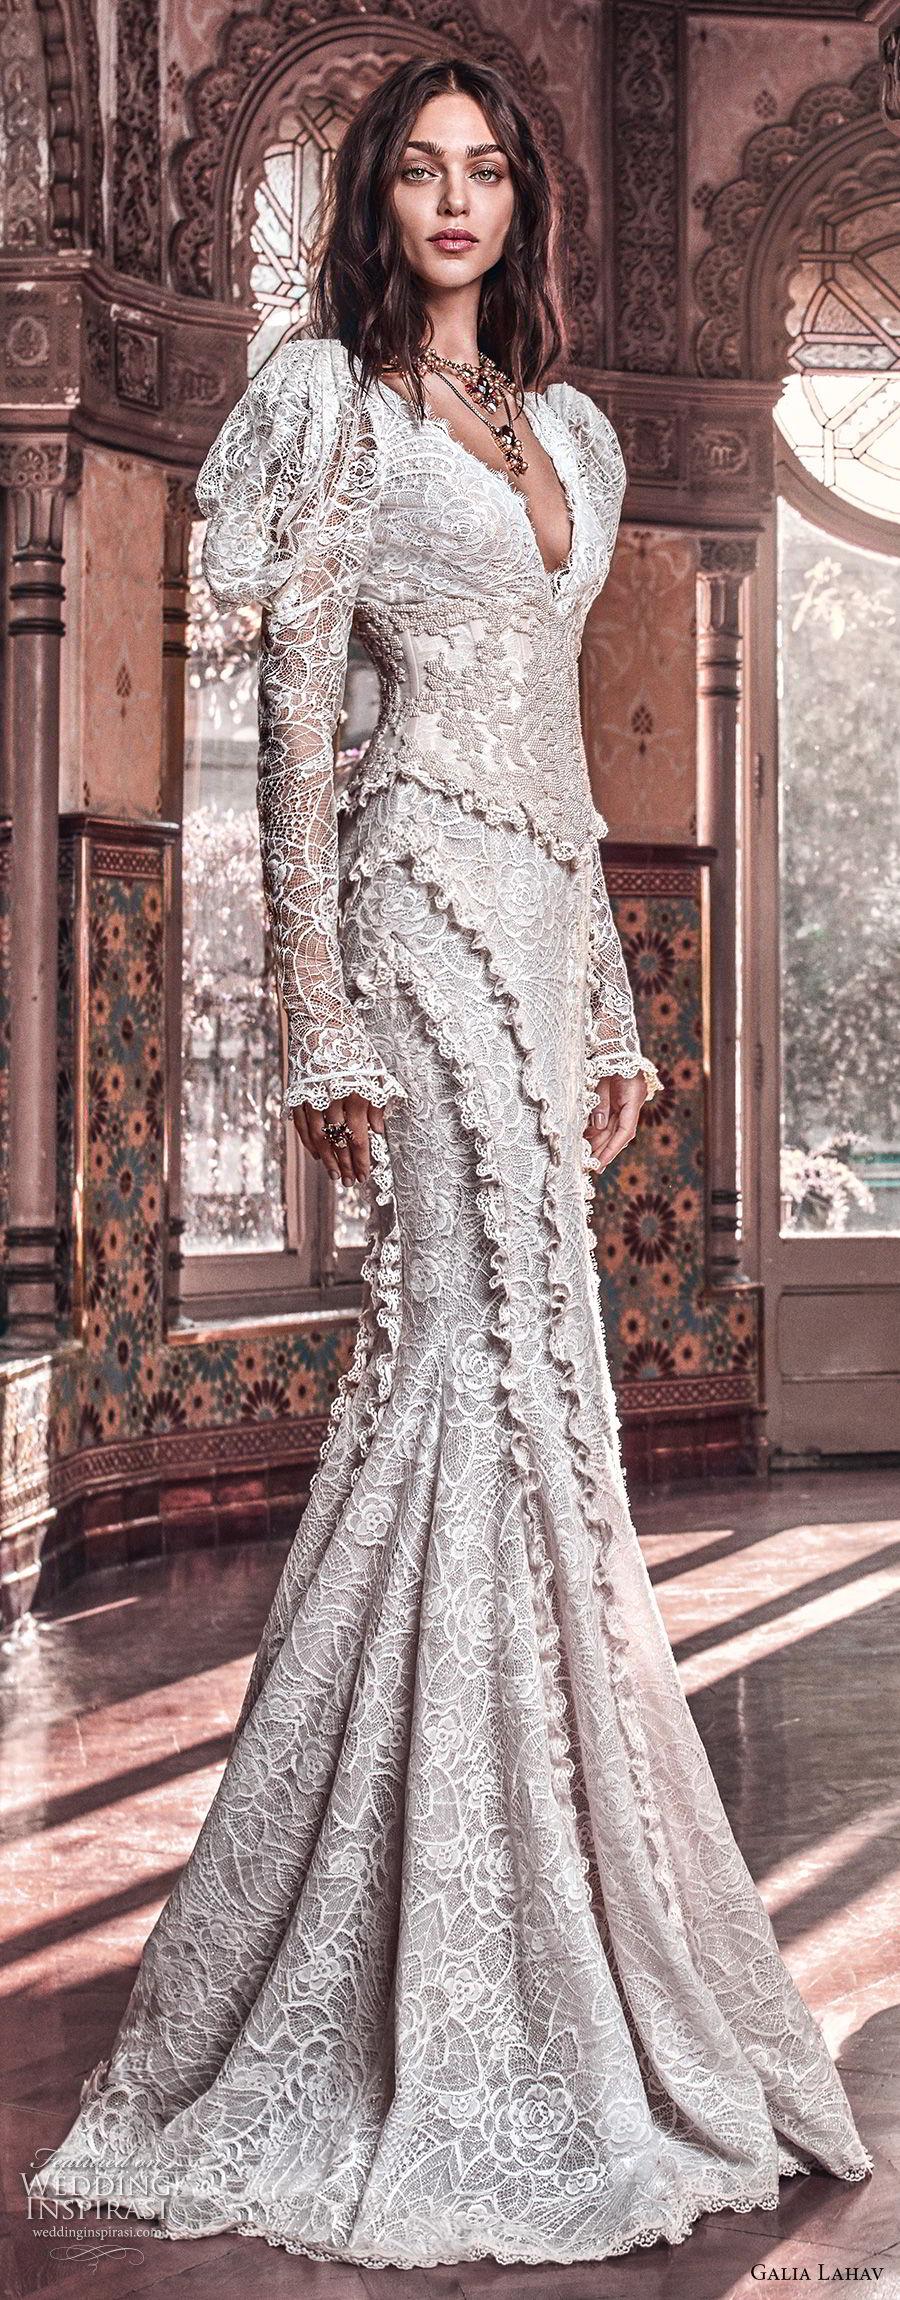 galia lahav spring 2018 bridal leg of mutton long sleeves v neck full embellishment elegant vintage fit and flare wedding dress mid scoop back chapel train (charlie and dolly belt) mv